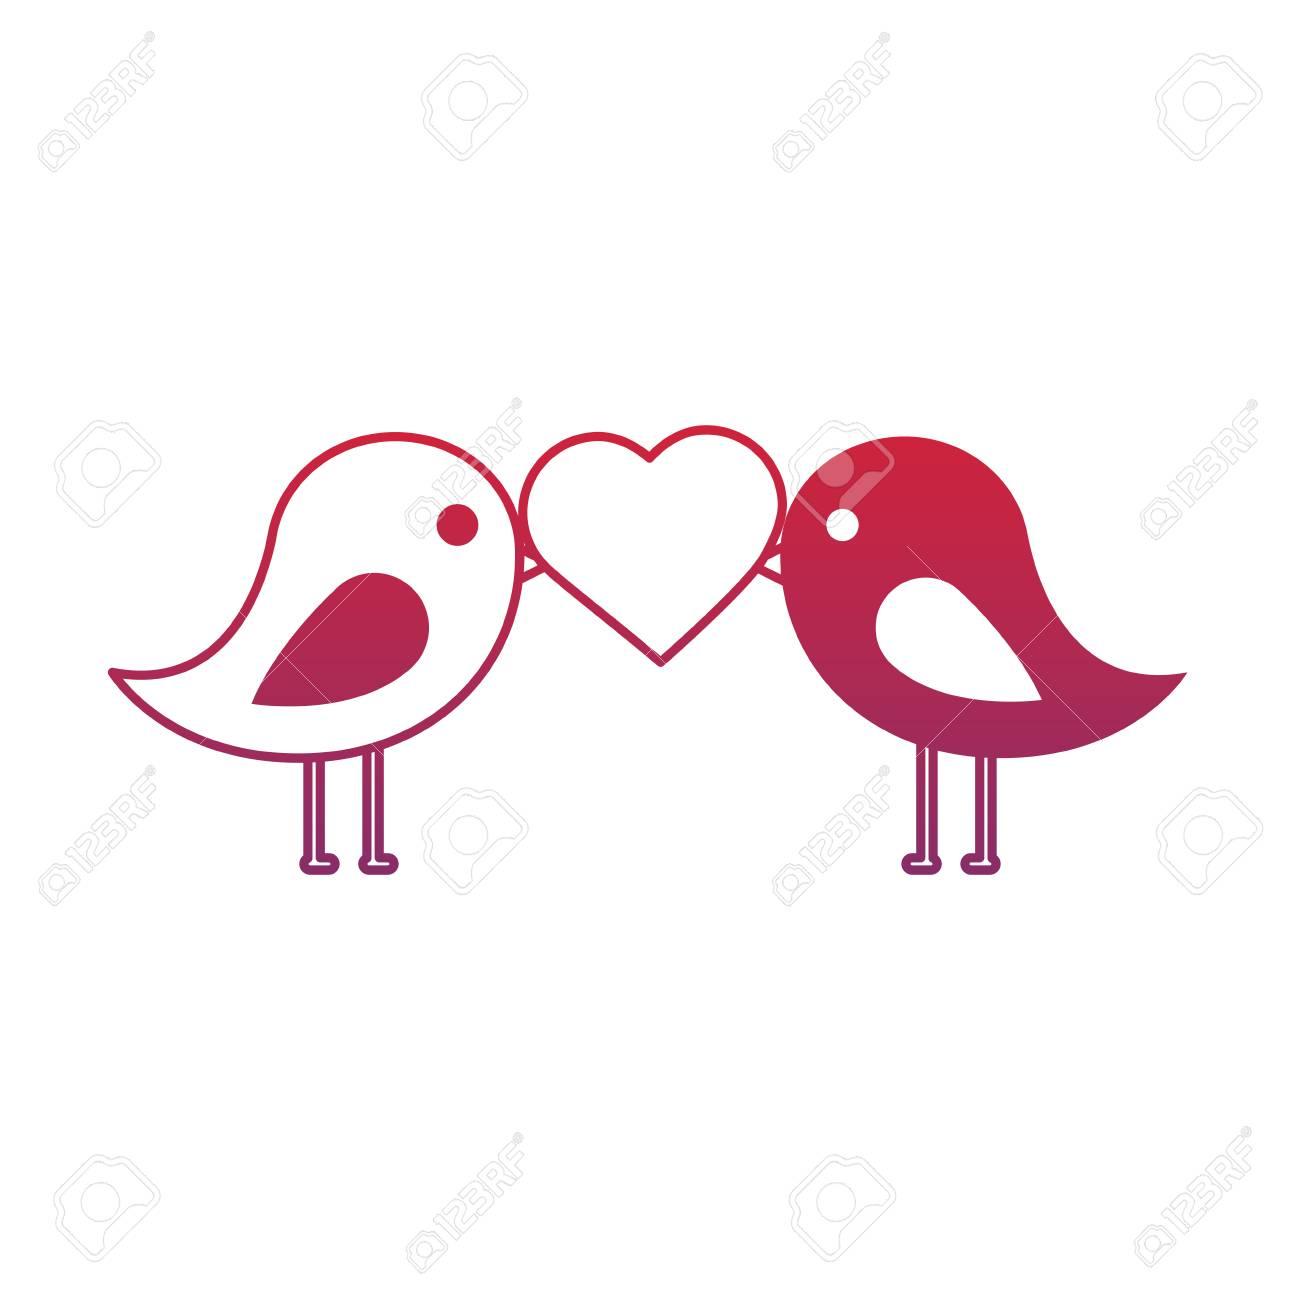 Nette Paare Vogel Herz In Schnabel Valentinstag Vektor Illustration